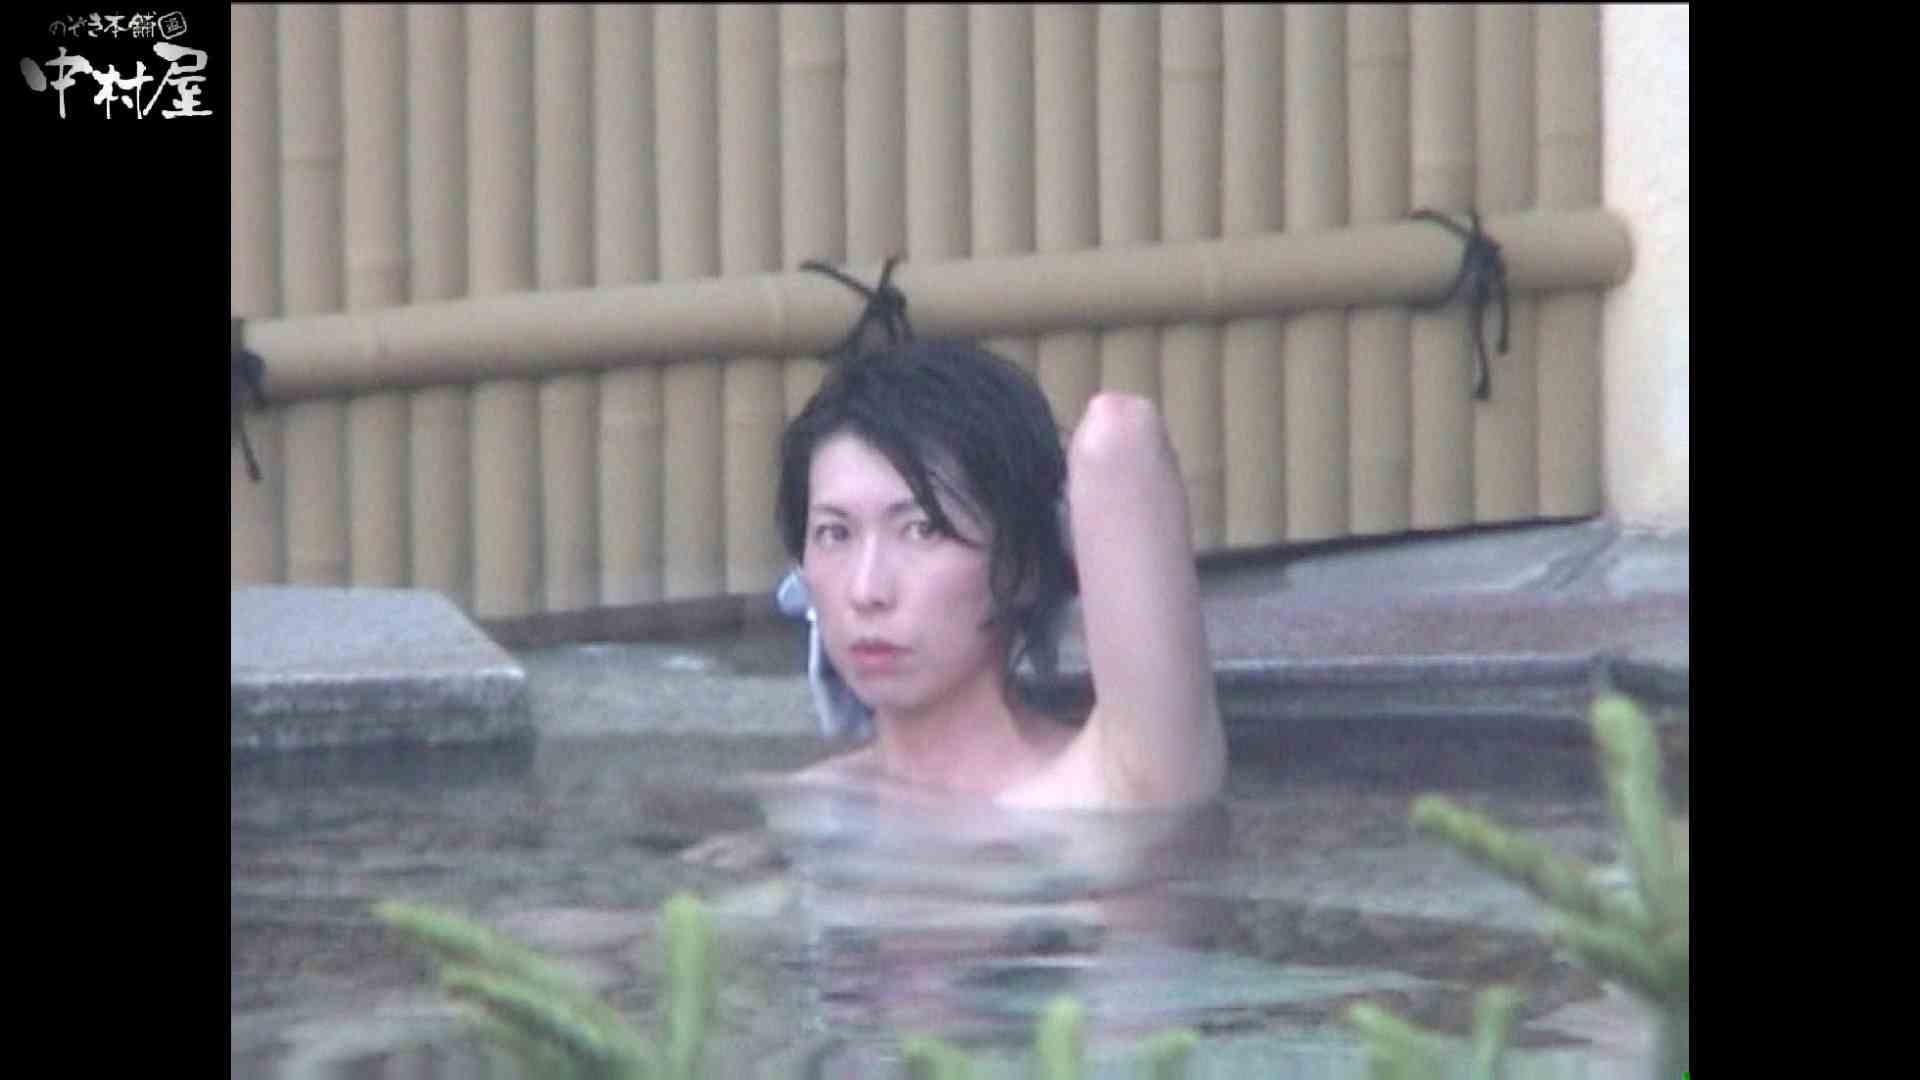 Aquaな露天風呂Vol.987 盗撮 | OLセックス  71画像 4